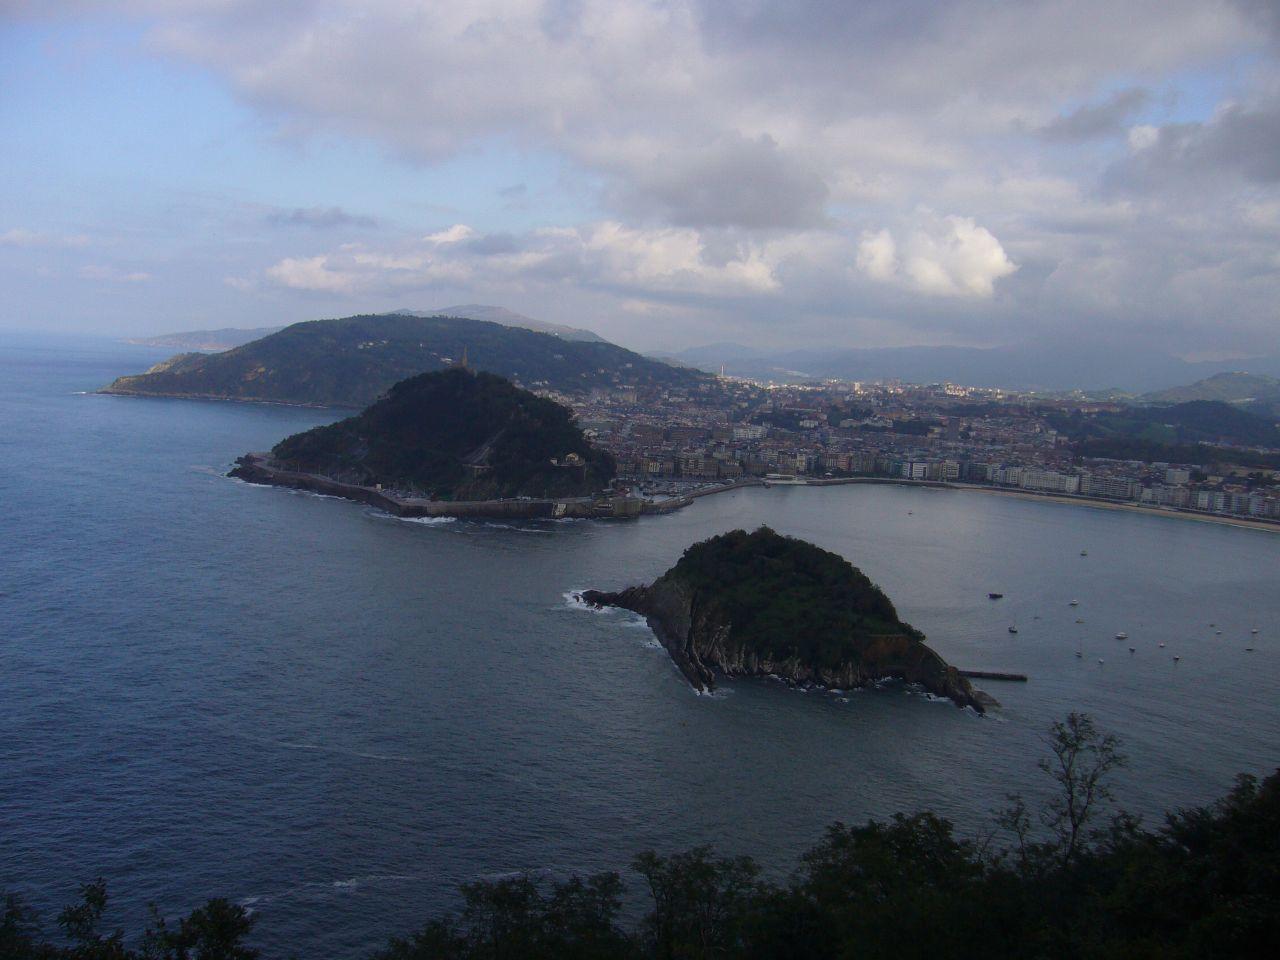 Isla de Santa Clara y Monte Urgull. Autor, Sfgamchick